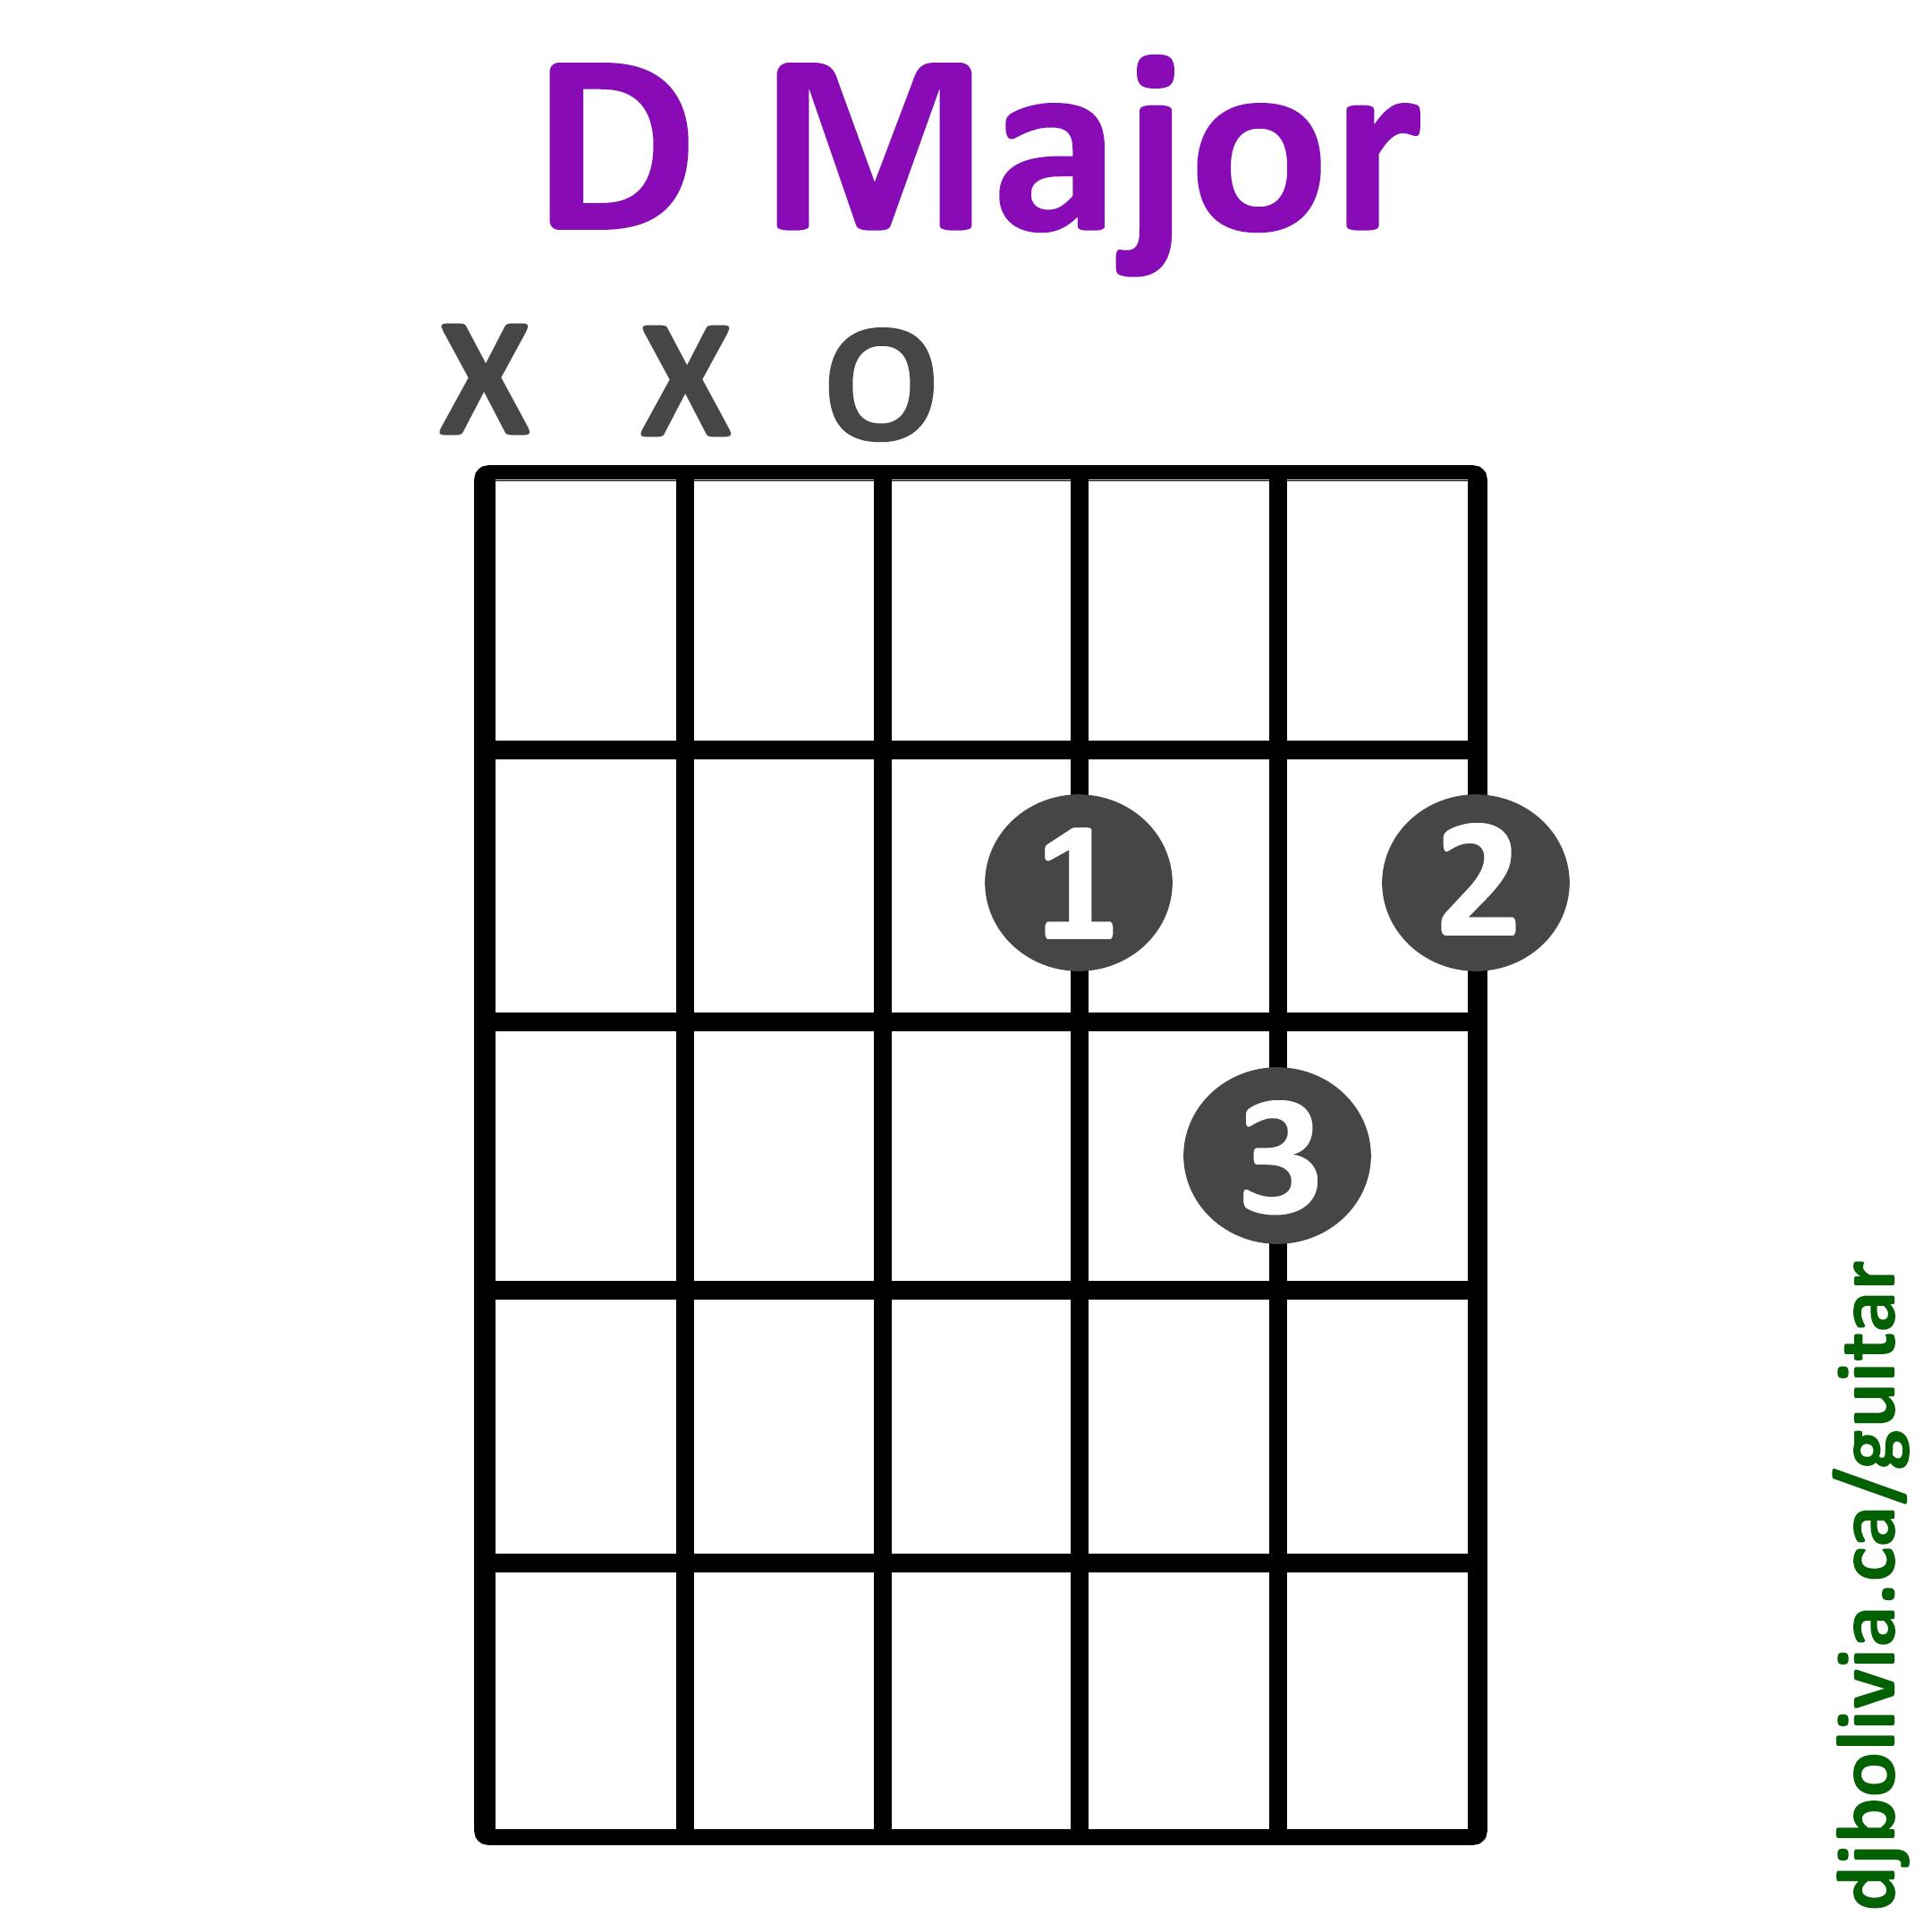 Soporific airs dj bolivia guitar for beginners course lyricschords httpazlyricslyrics creedenceclearwaterrevivalrunthroughthejungleml stopboris Images